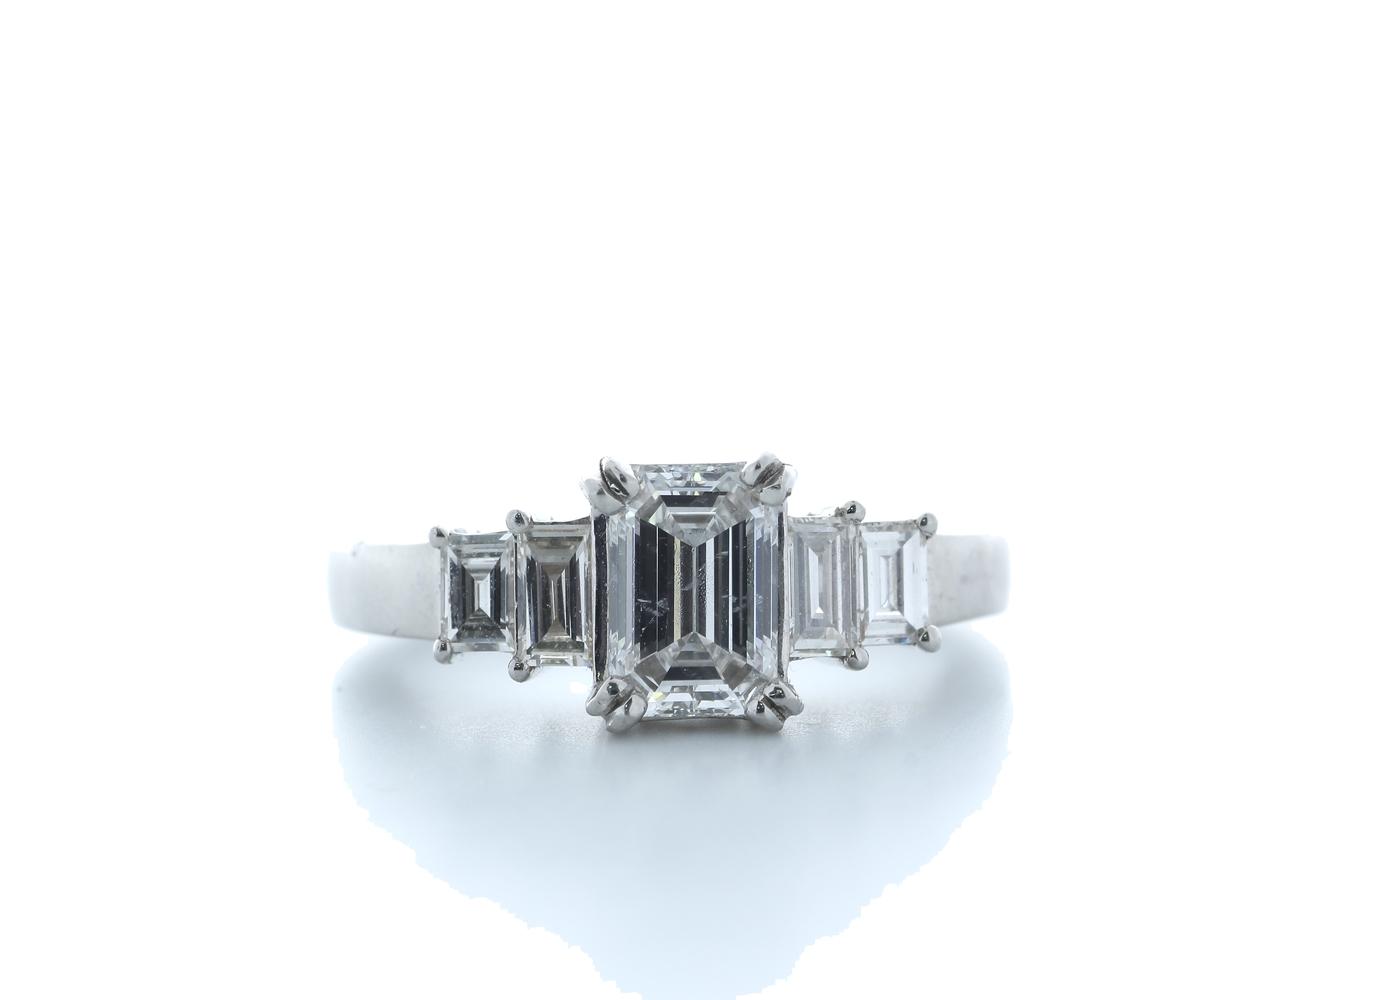 18ct White Gold Emerald Cut Diamond Ring 1.73 (1.23) Carats